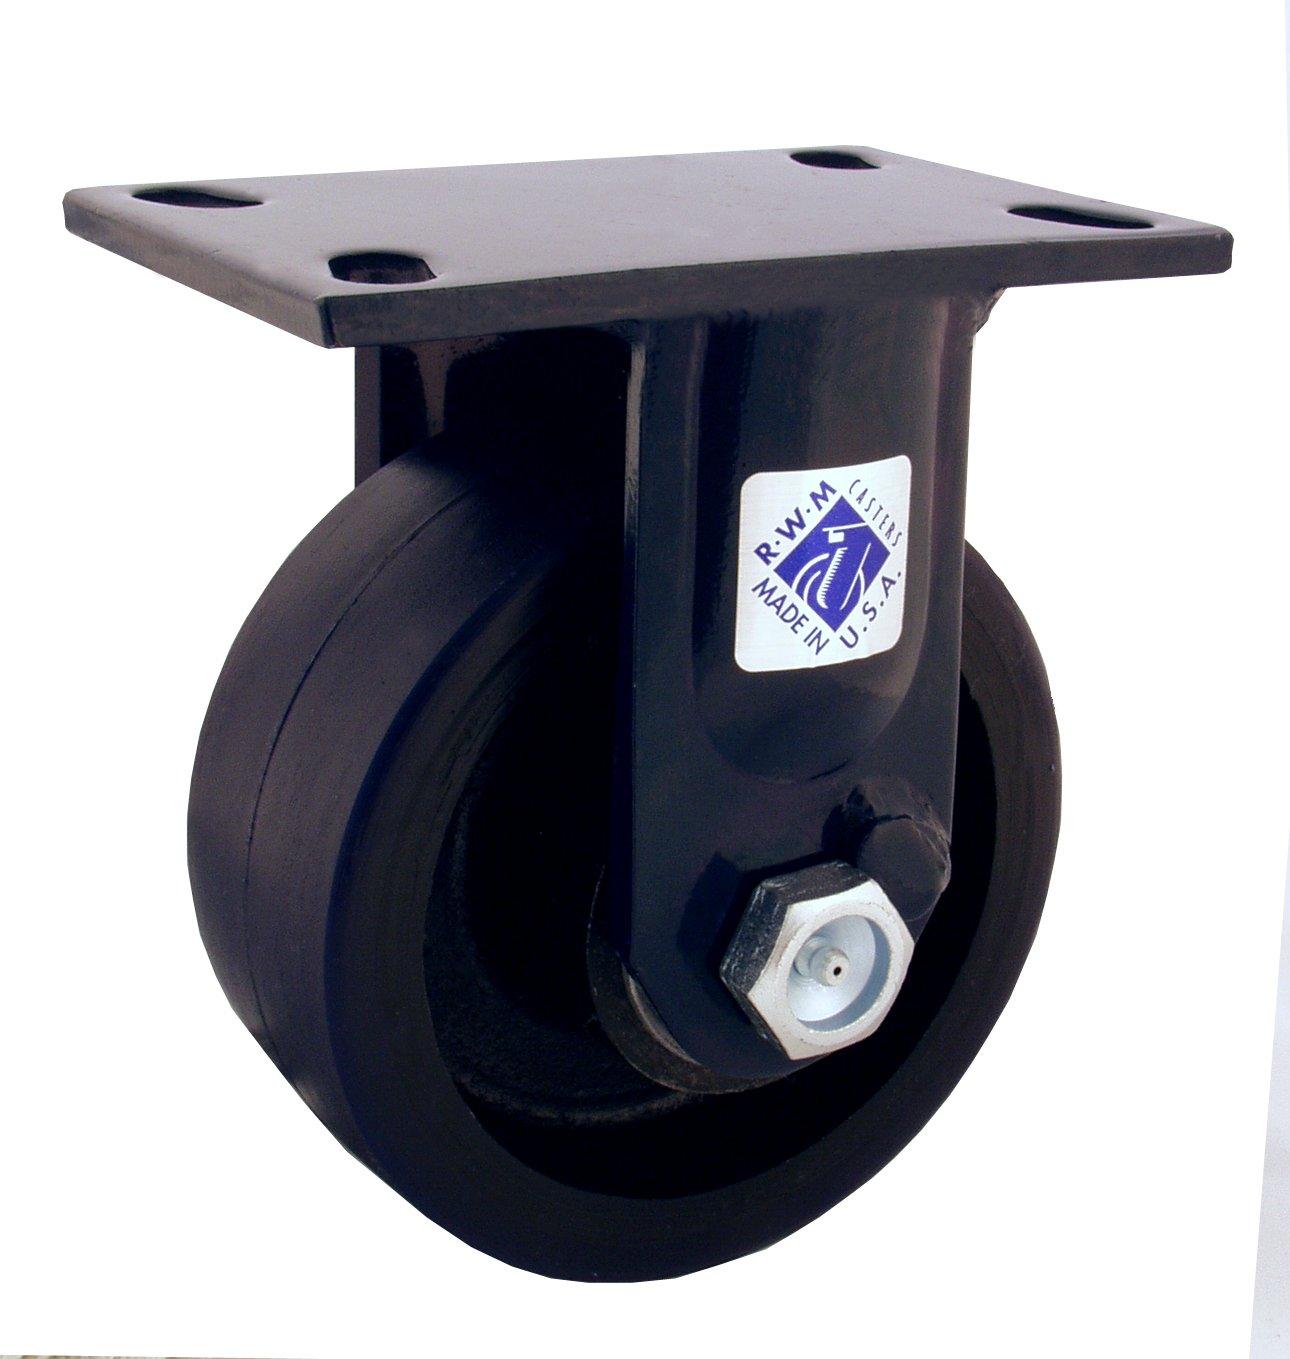 RWM Casters 75 Series Plate Caster, Rigid, Kingpinless, Forged Steel Wheel, Roller Bearing, 5000 lbs Capacity, 6'' Wheel Dia, 2-1/2'' Wheel Width, 7-1/2'' Mount Height, 6-1/2'' Plate Length, 4-1/2'' Plate Width